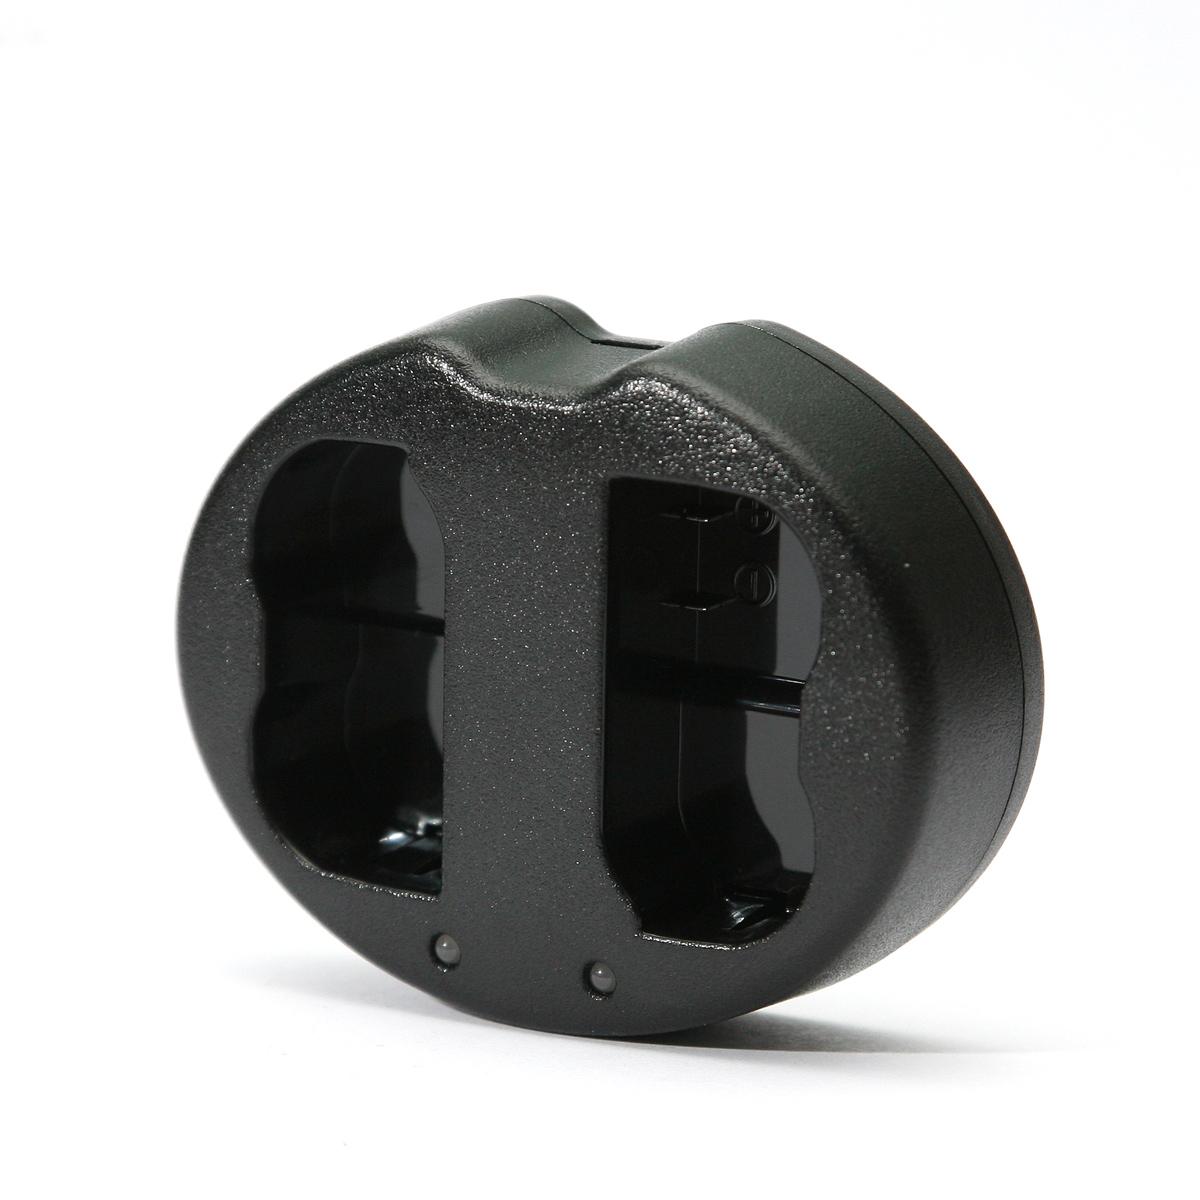 Купить Зарядное устройство PowerPlant Dual Canon LP-E6 для двух аккумуляторов